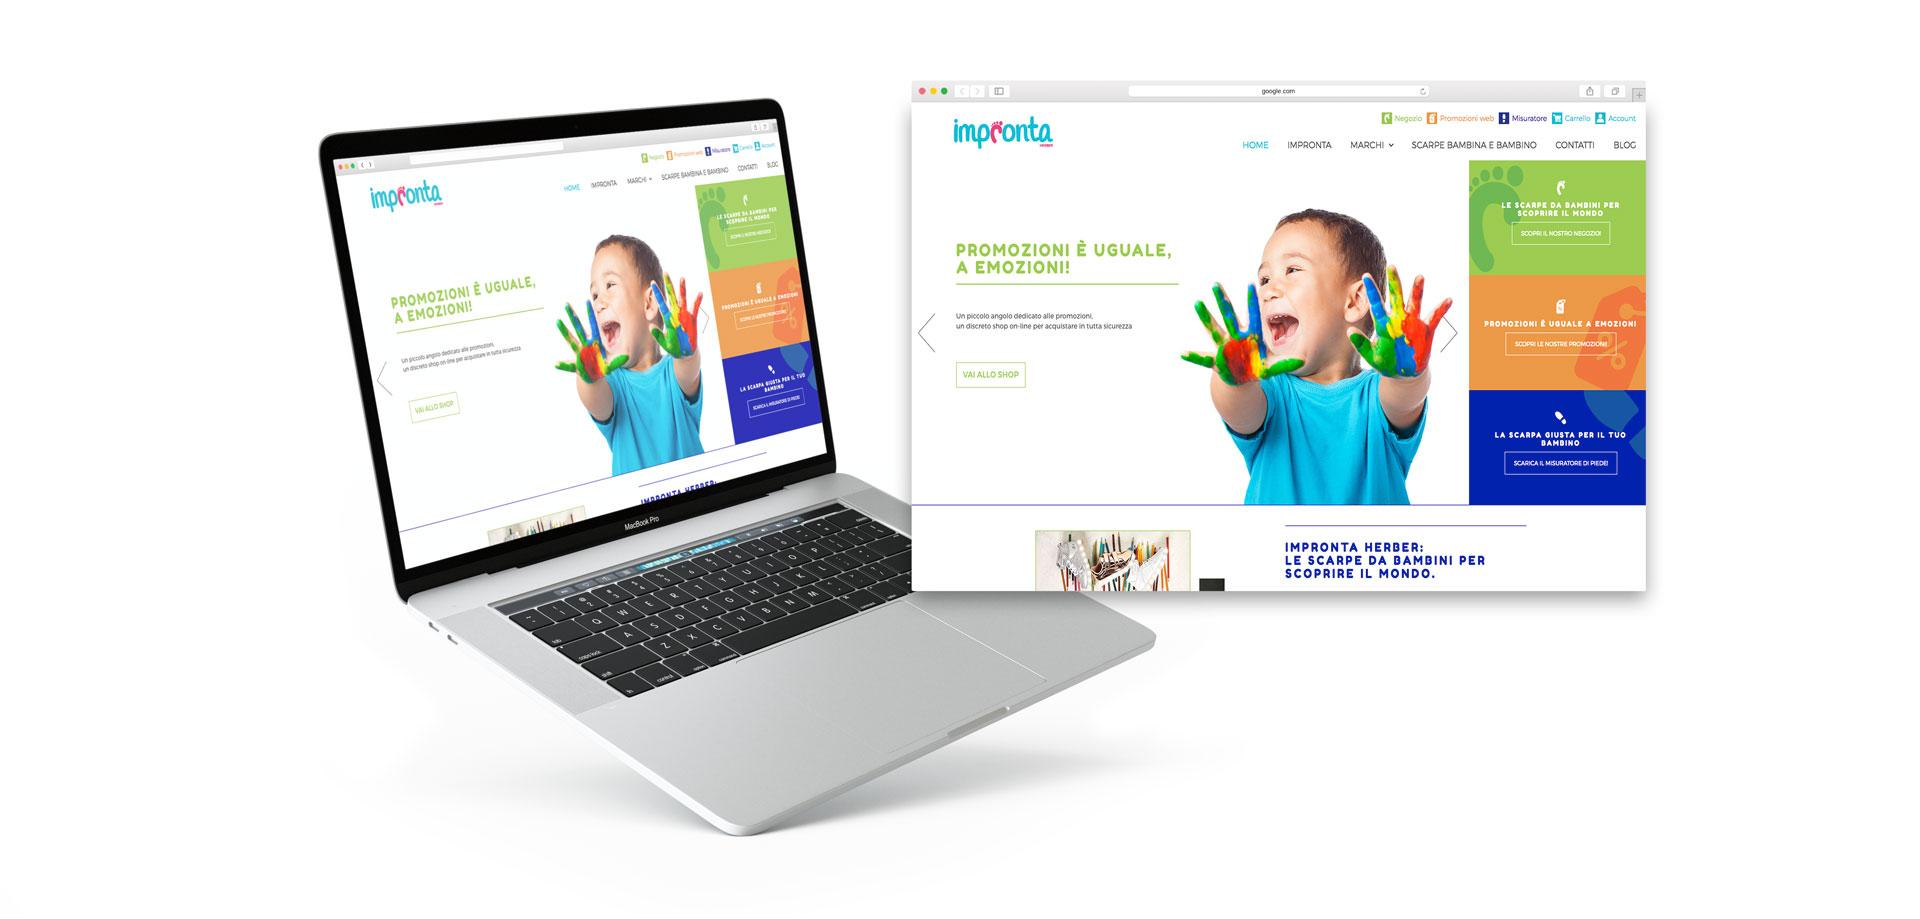 GSite-web-agency-impronta-herber-sitoweb